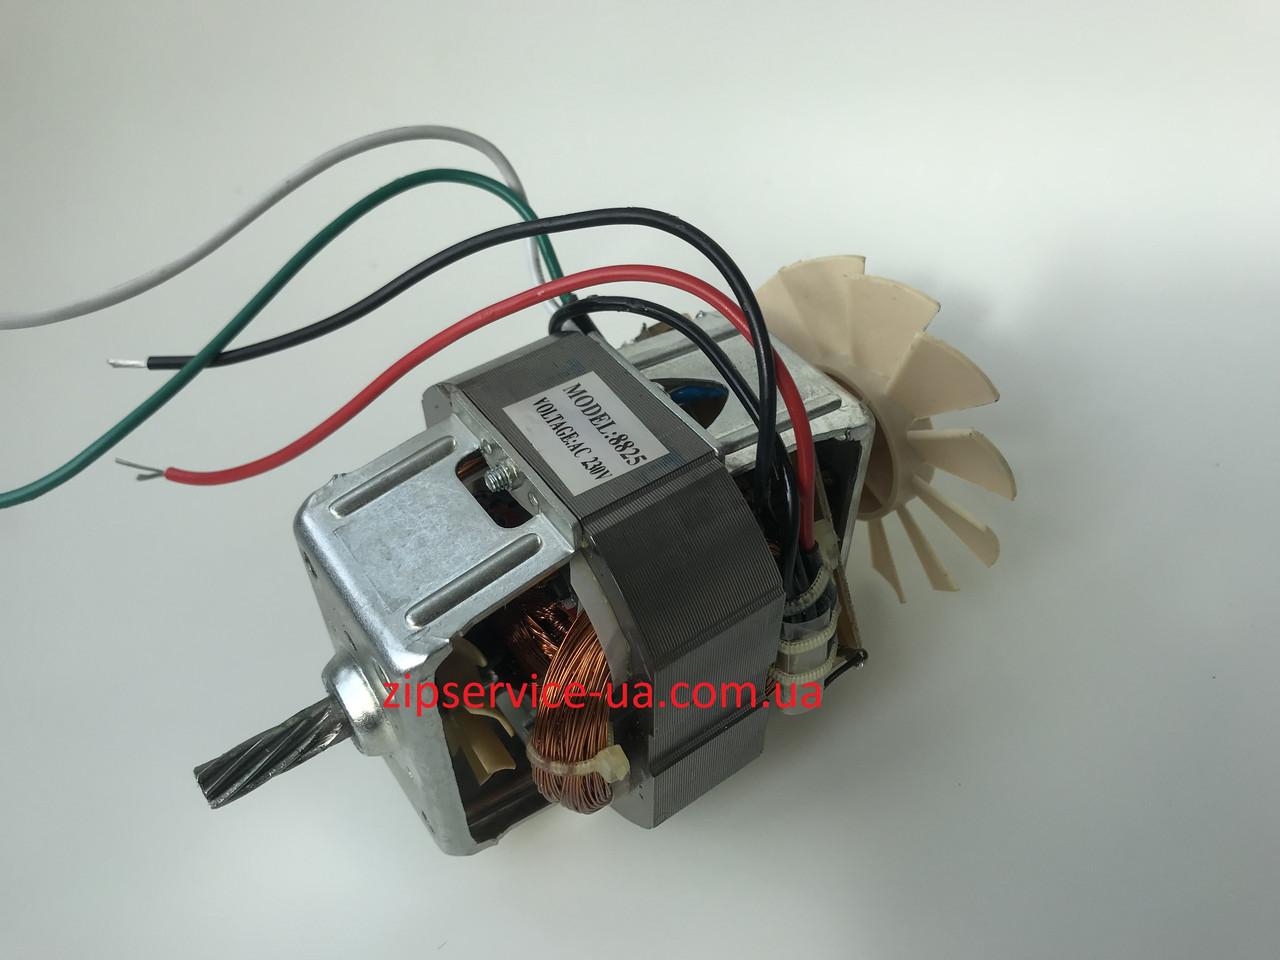 Двигатель электро мясорубки 8825, 220-240V, 50-60Hz, 350-450W